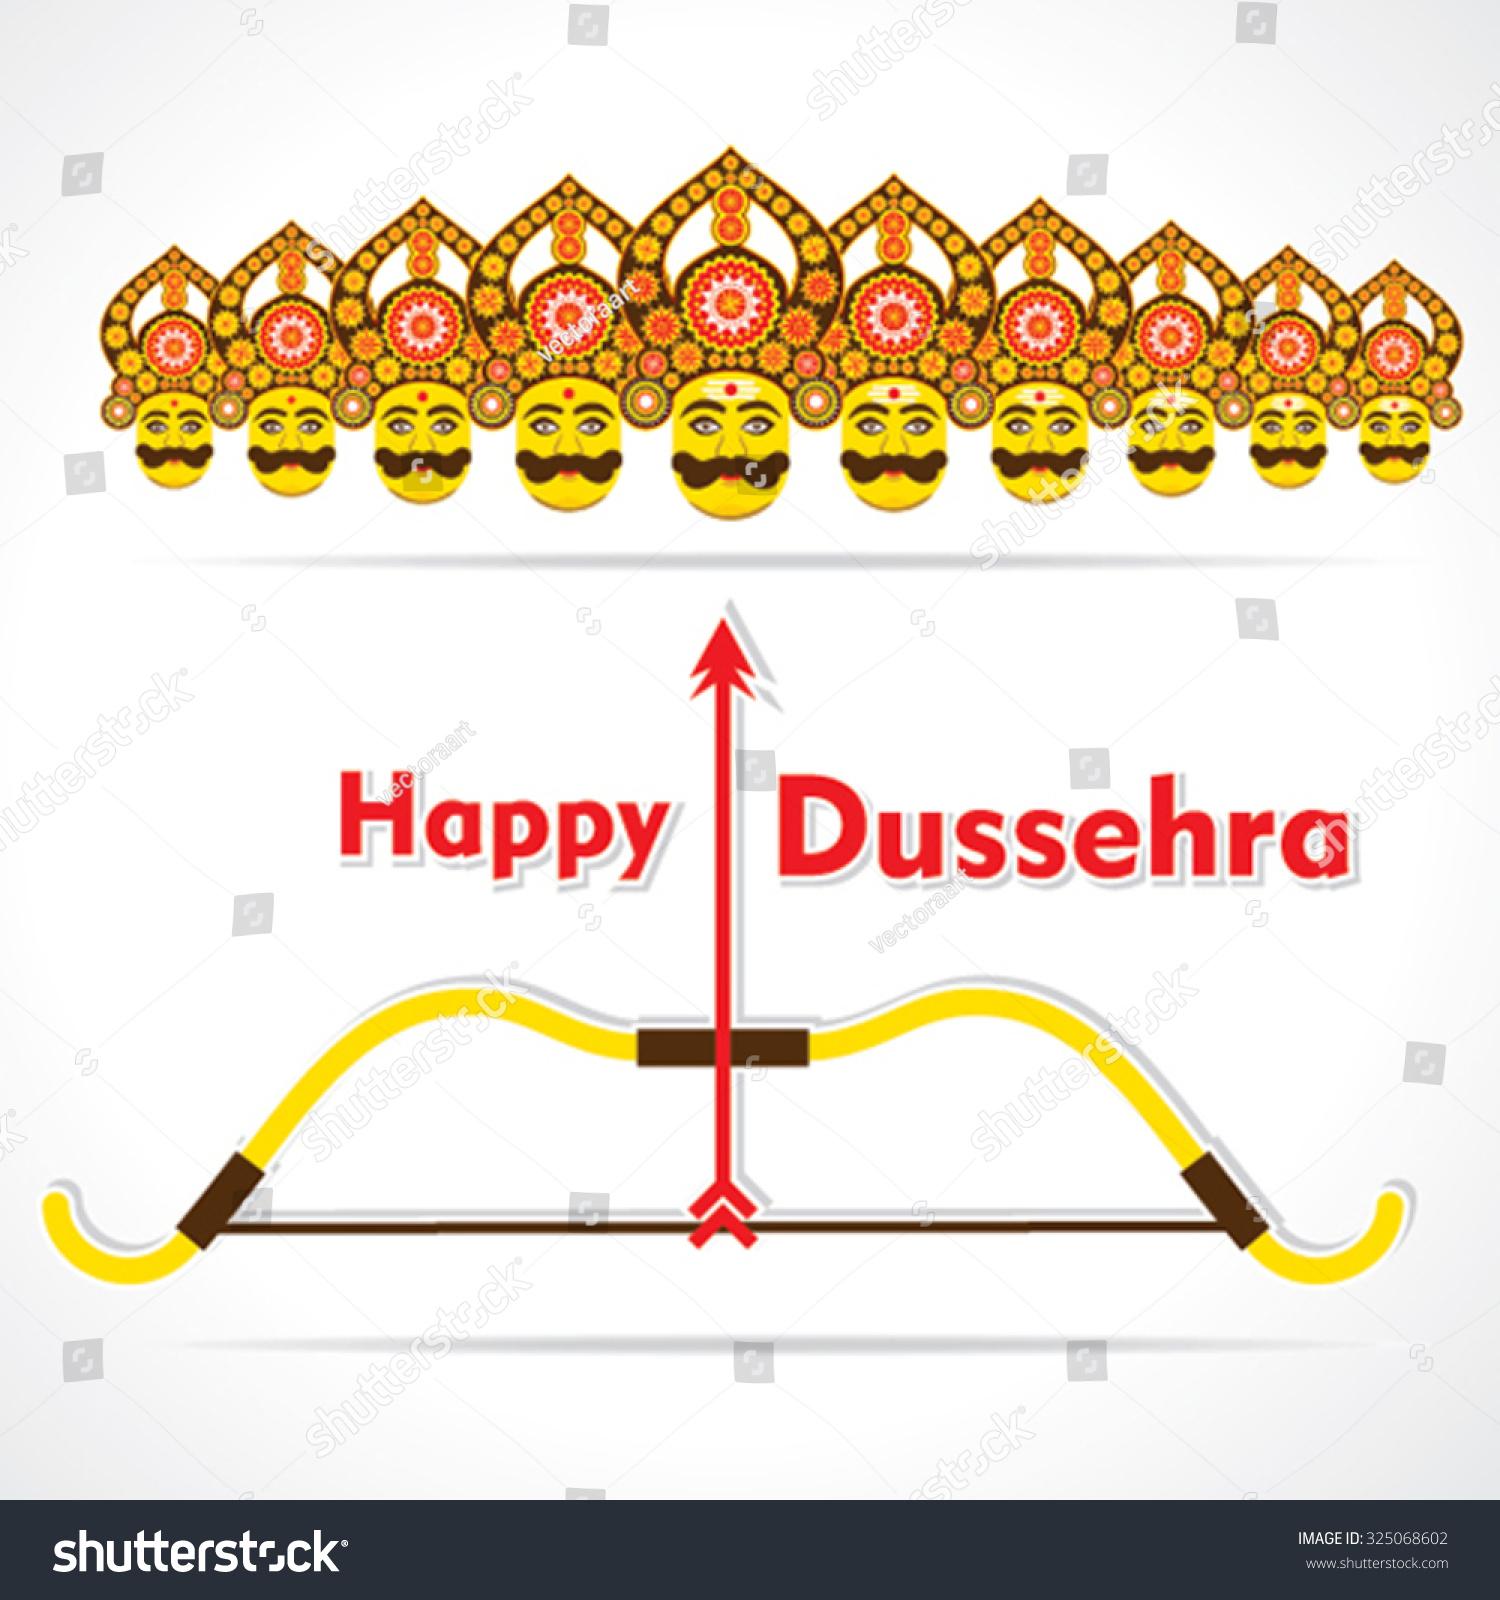 Creative Happy Dussehra Festival Greeting Card Stock Photo Photo